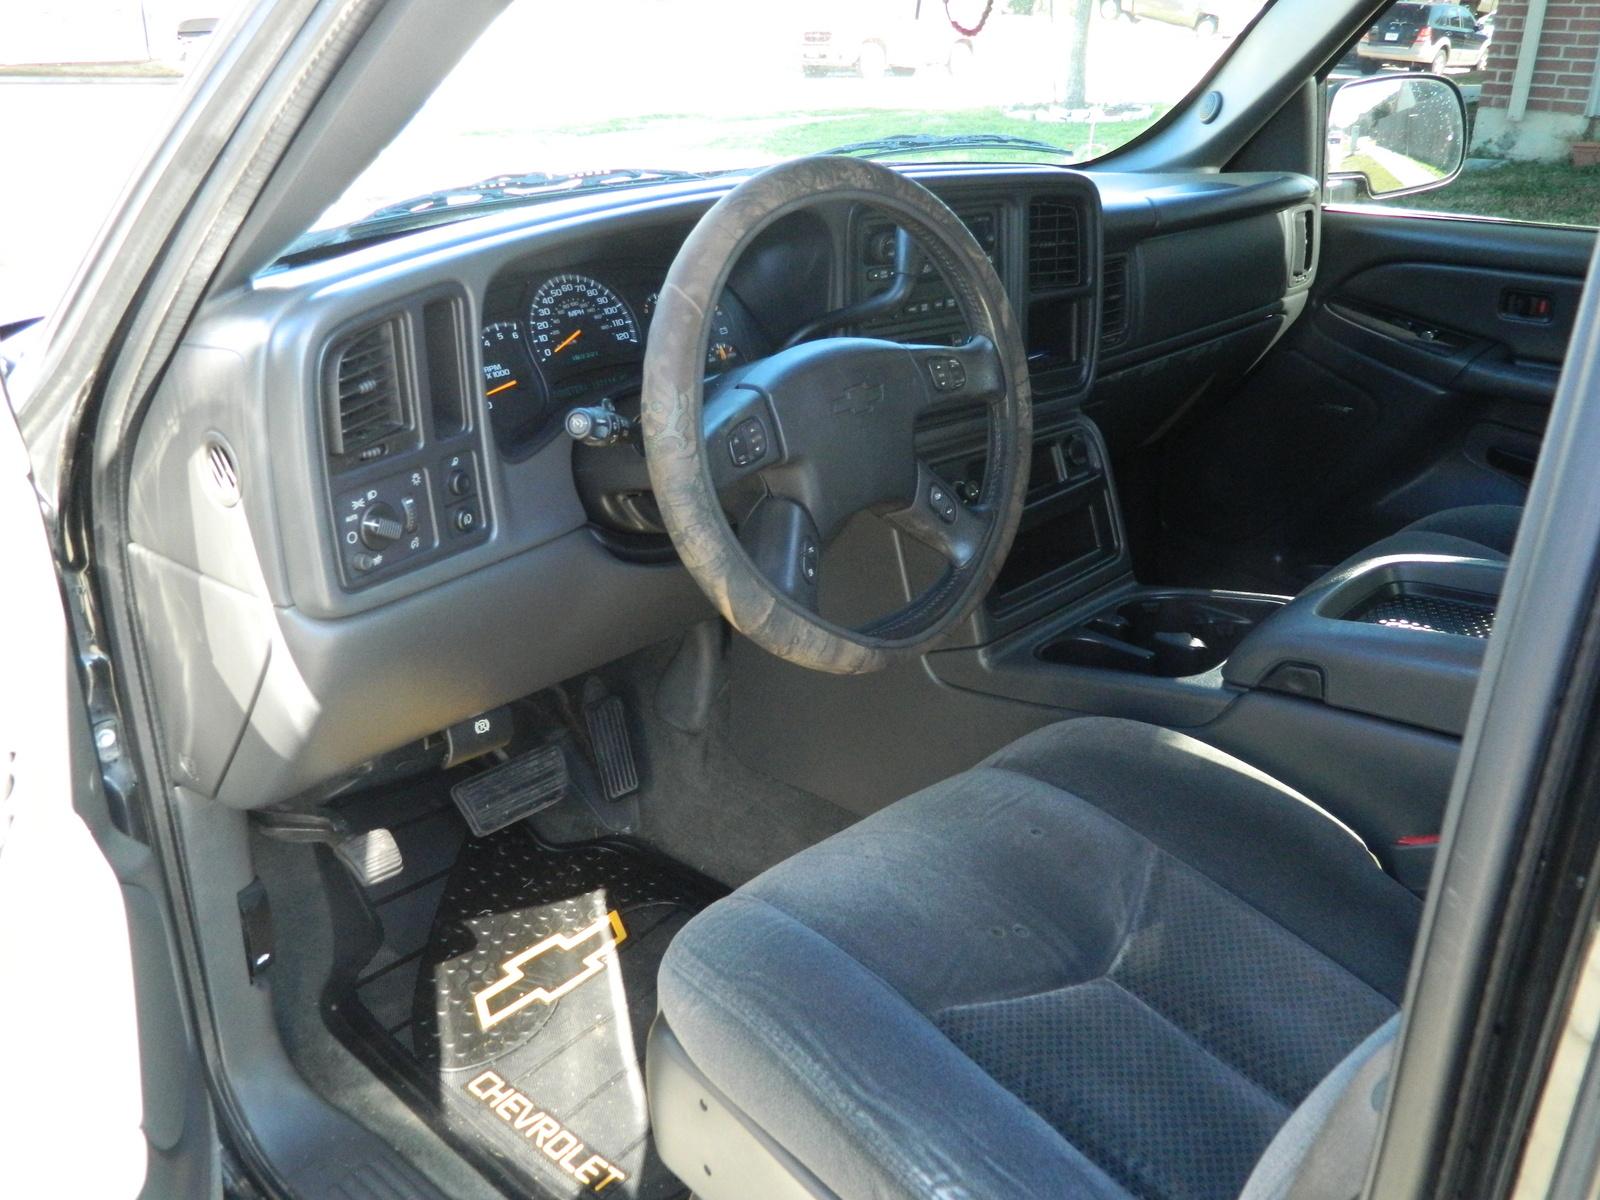 2004 Chevrolet Silverado 1500 - Pictures - CarGurus